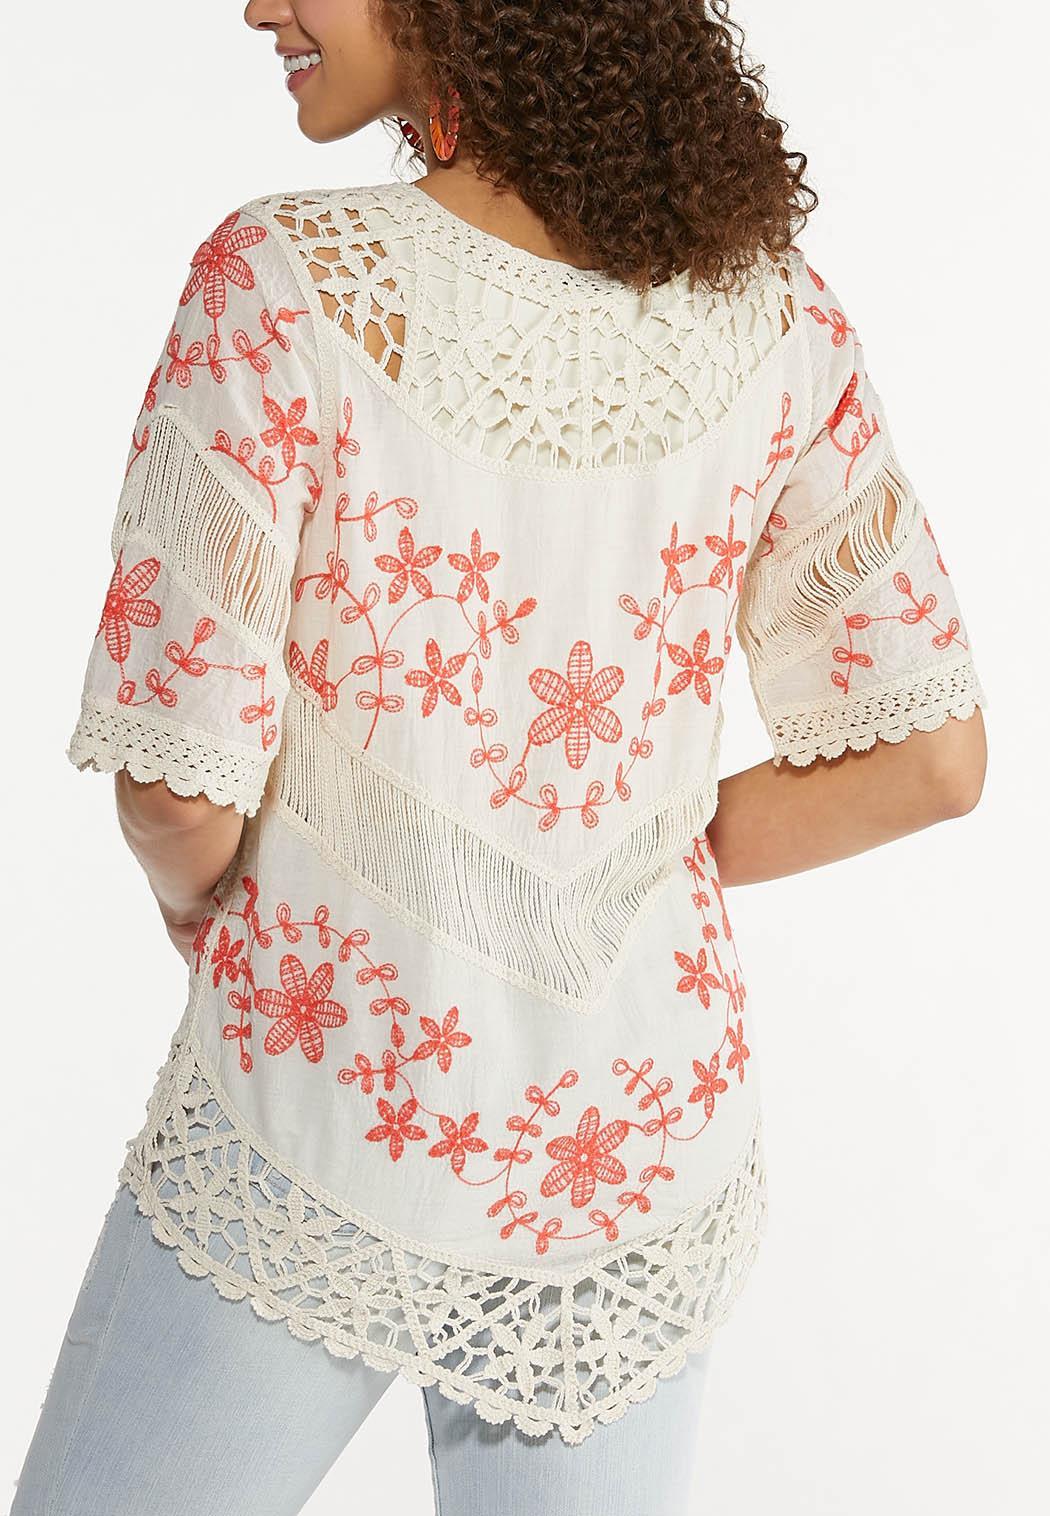 Crochet Floral Tunic (Item #44575483)